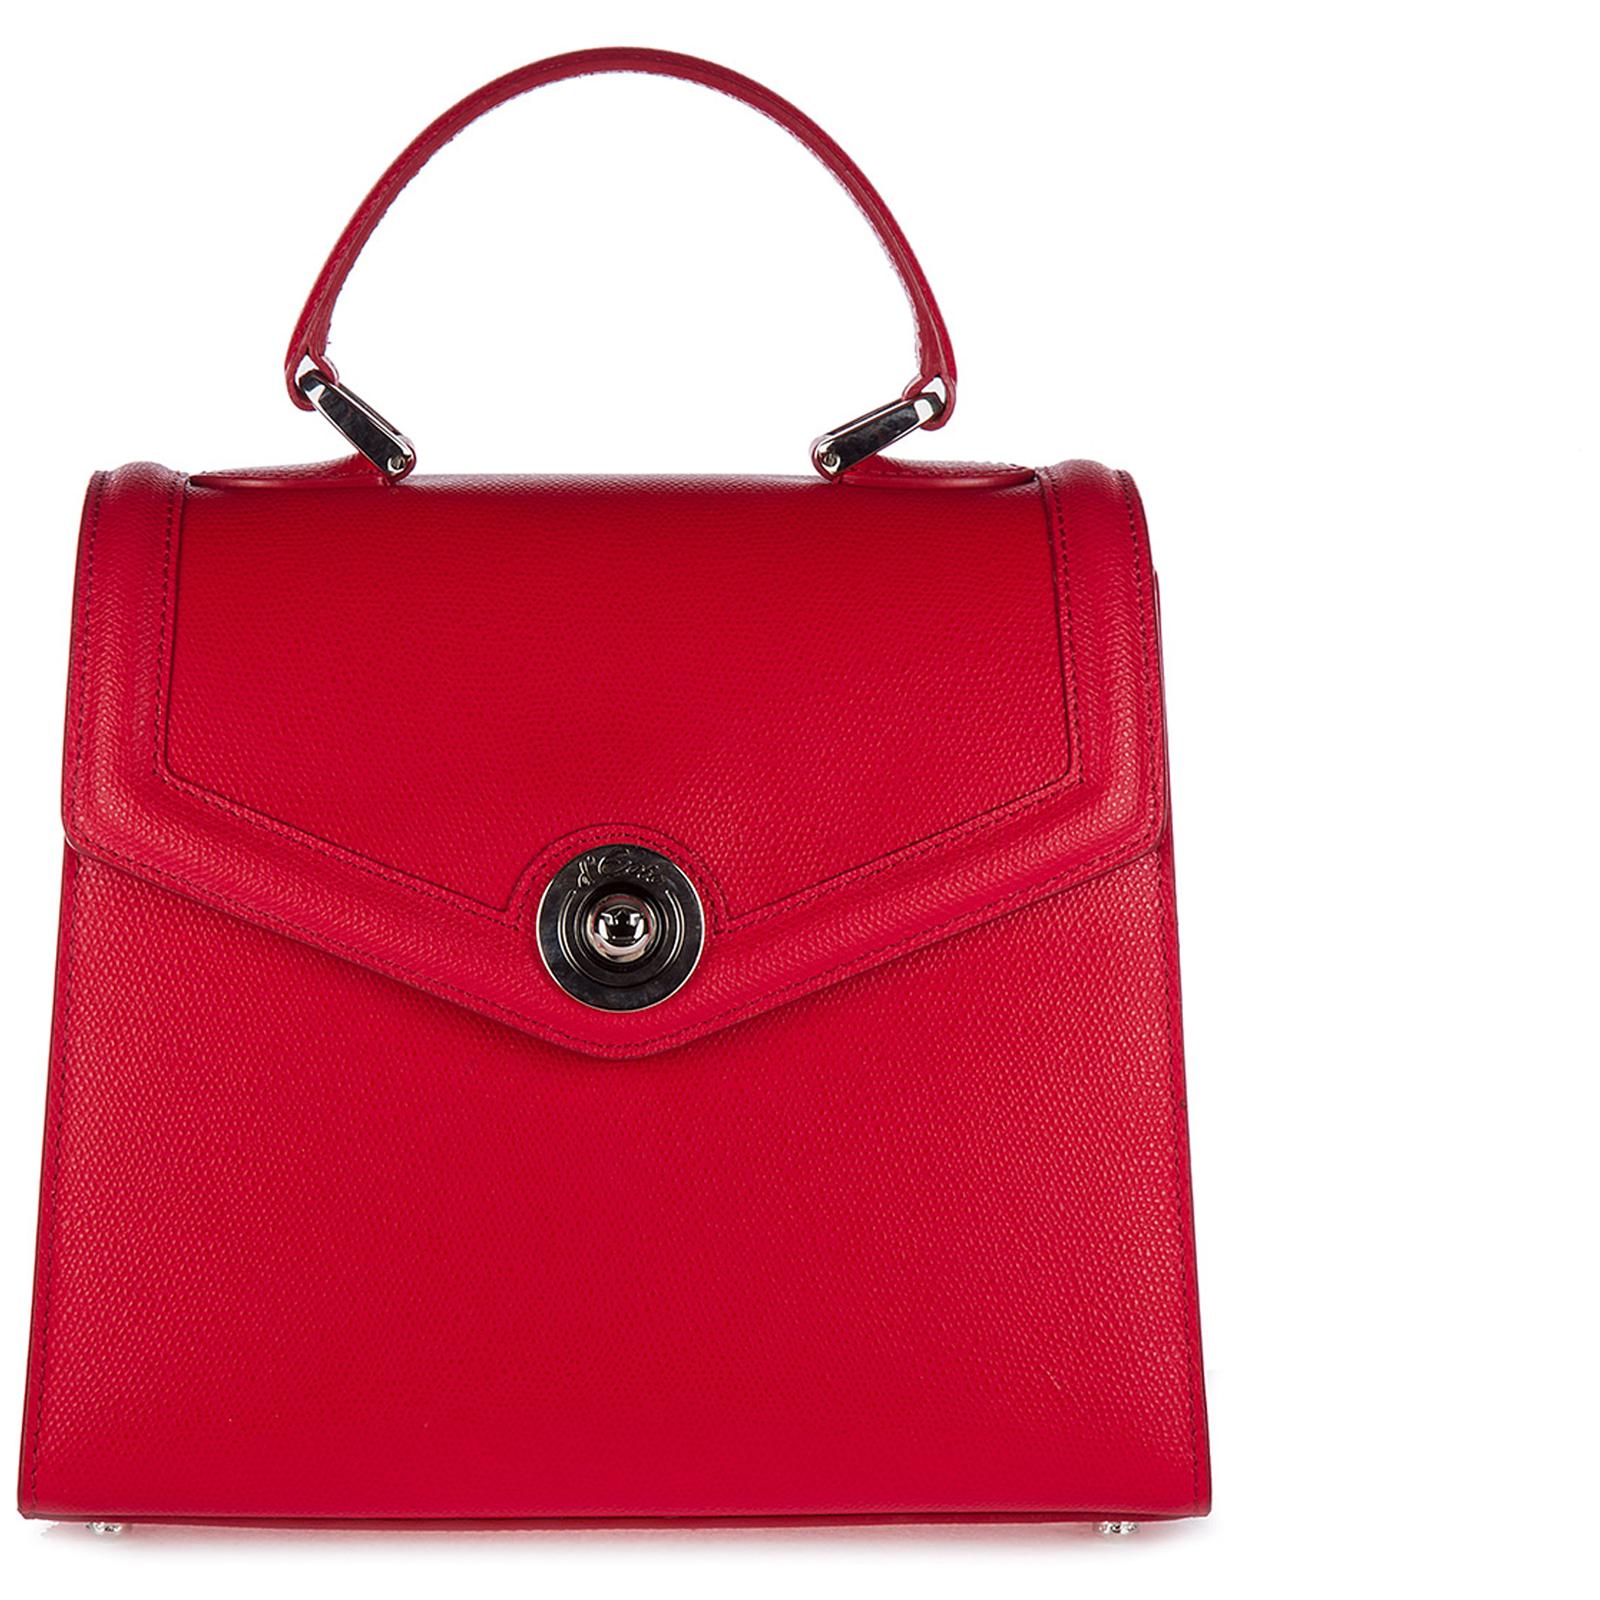 Leder handtasche damen tasche bag monaco